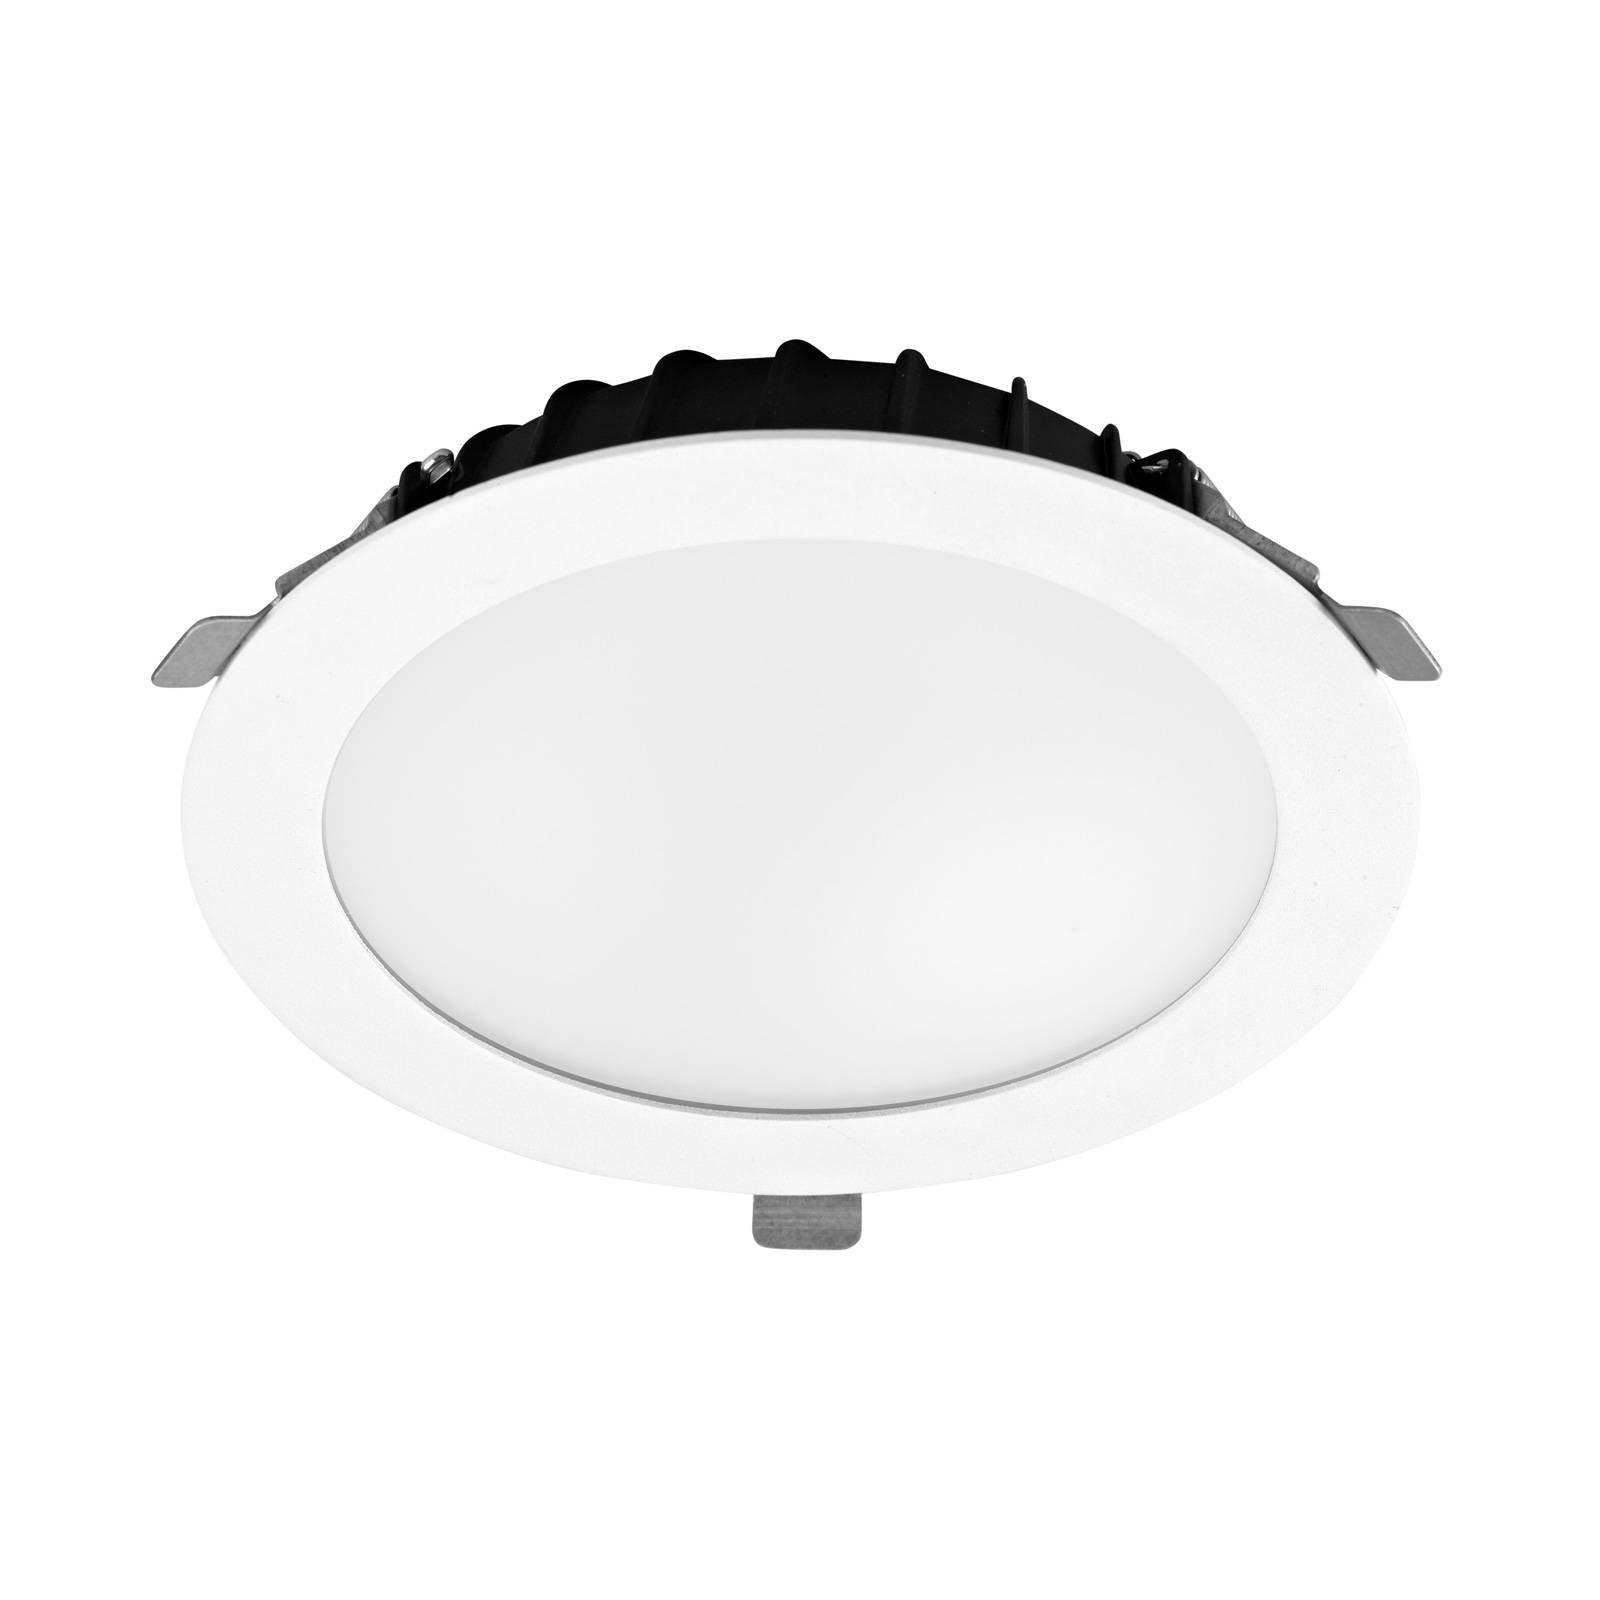 LEDS-C4 Vol downlight Ø 20,5 cm 3 000 K